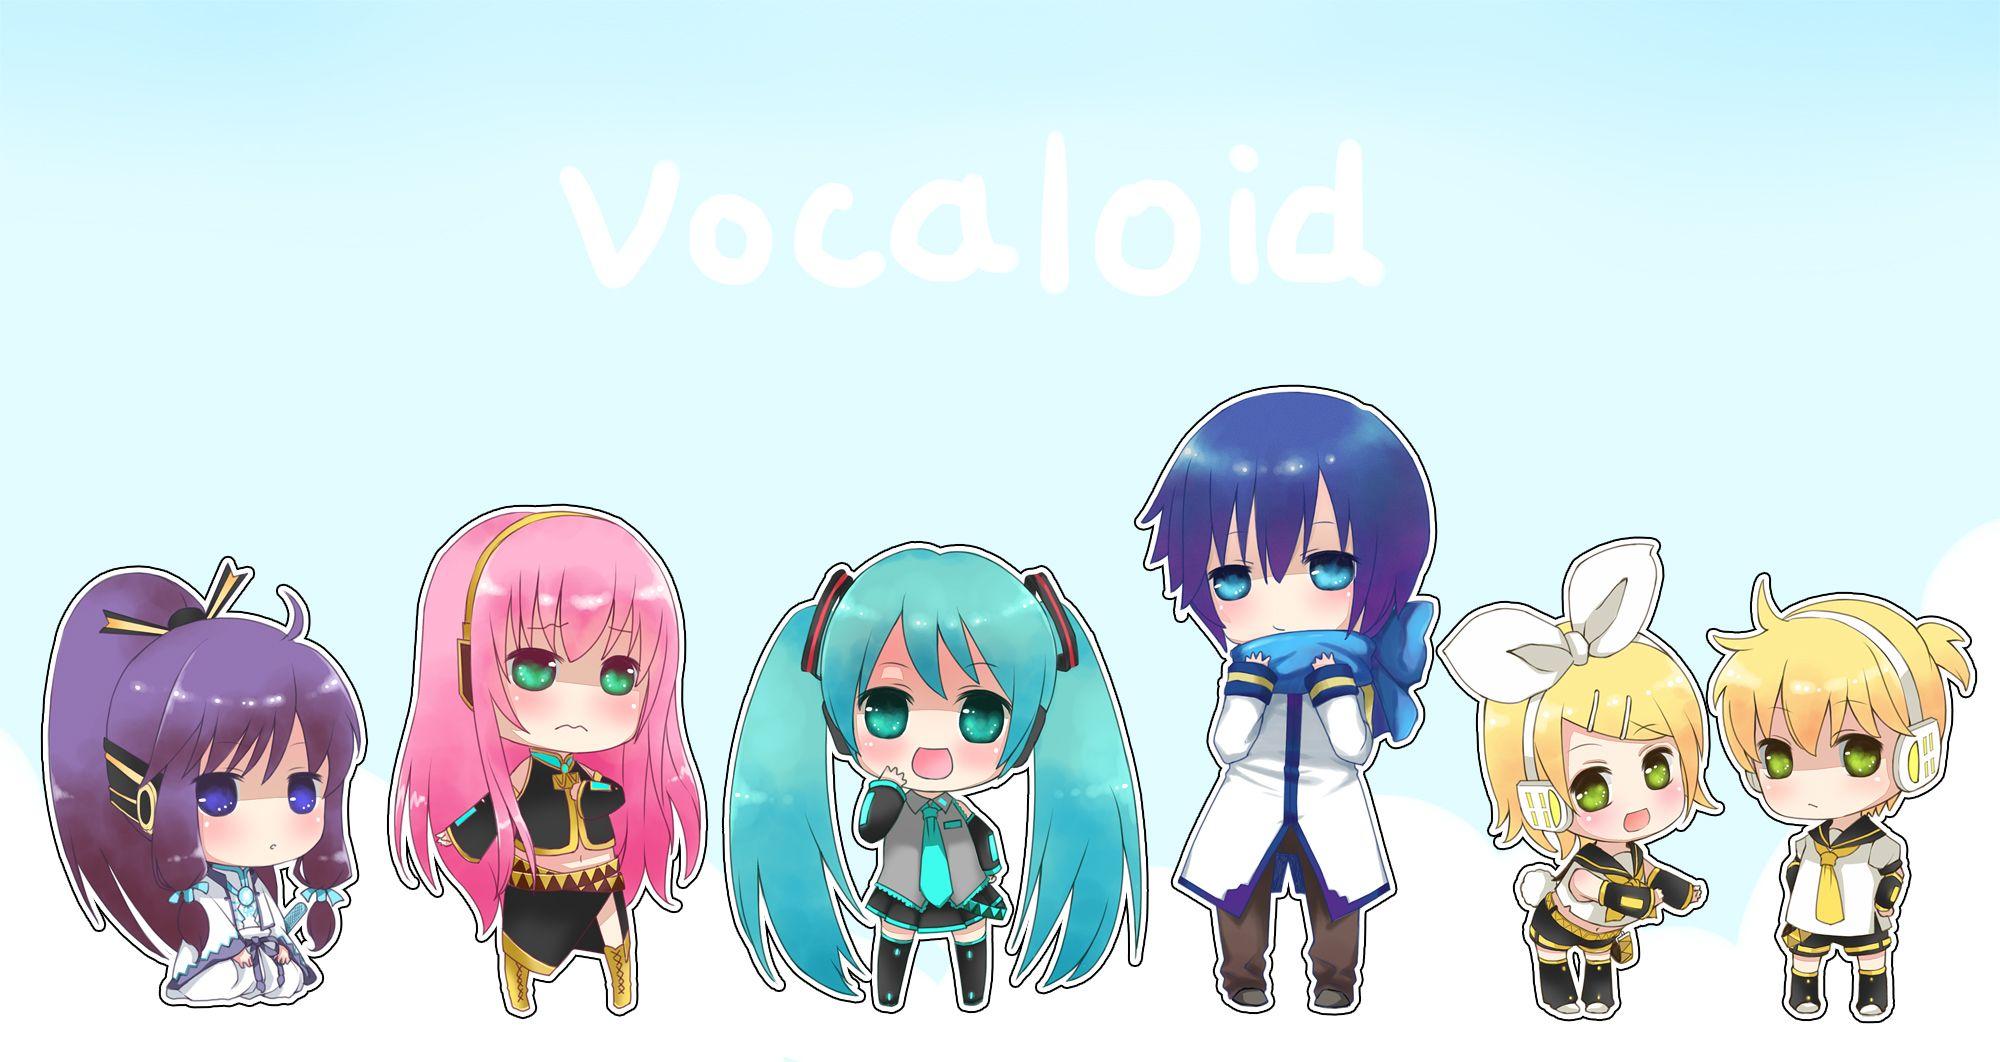 Chibi Vocaloid Chibi Wallpaper Chibi Anime Chibi Download wallpaper anime chibi